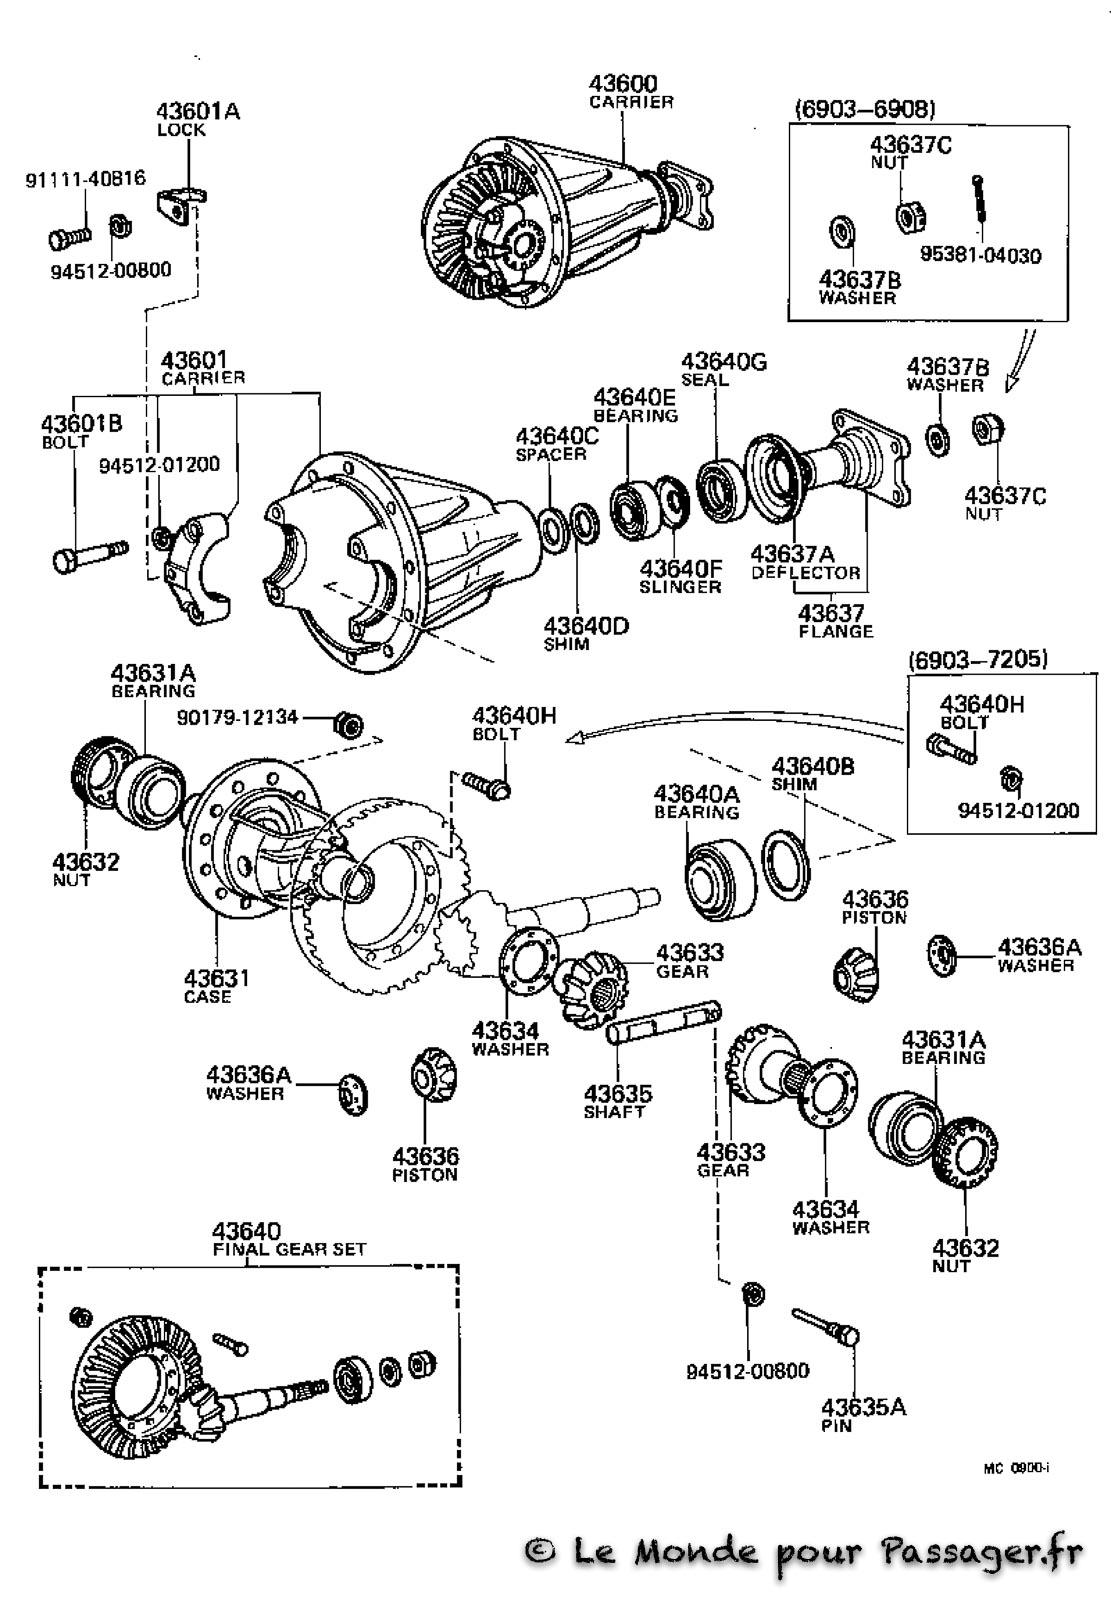 Fj55-Eclatés-Techniques122